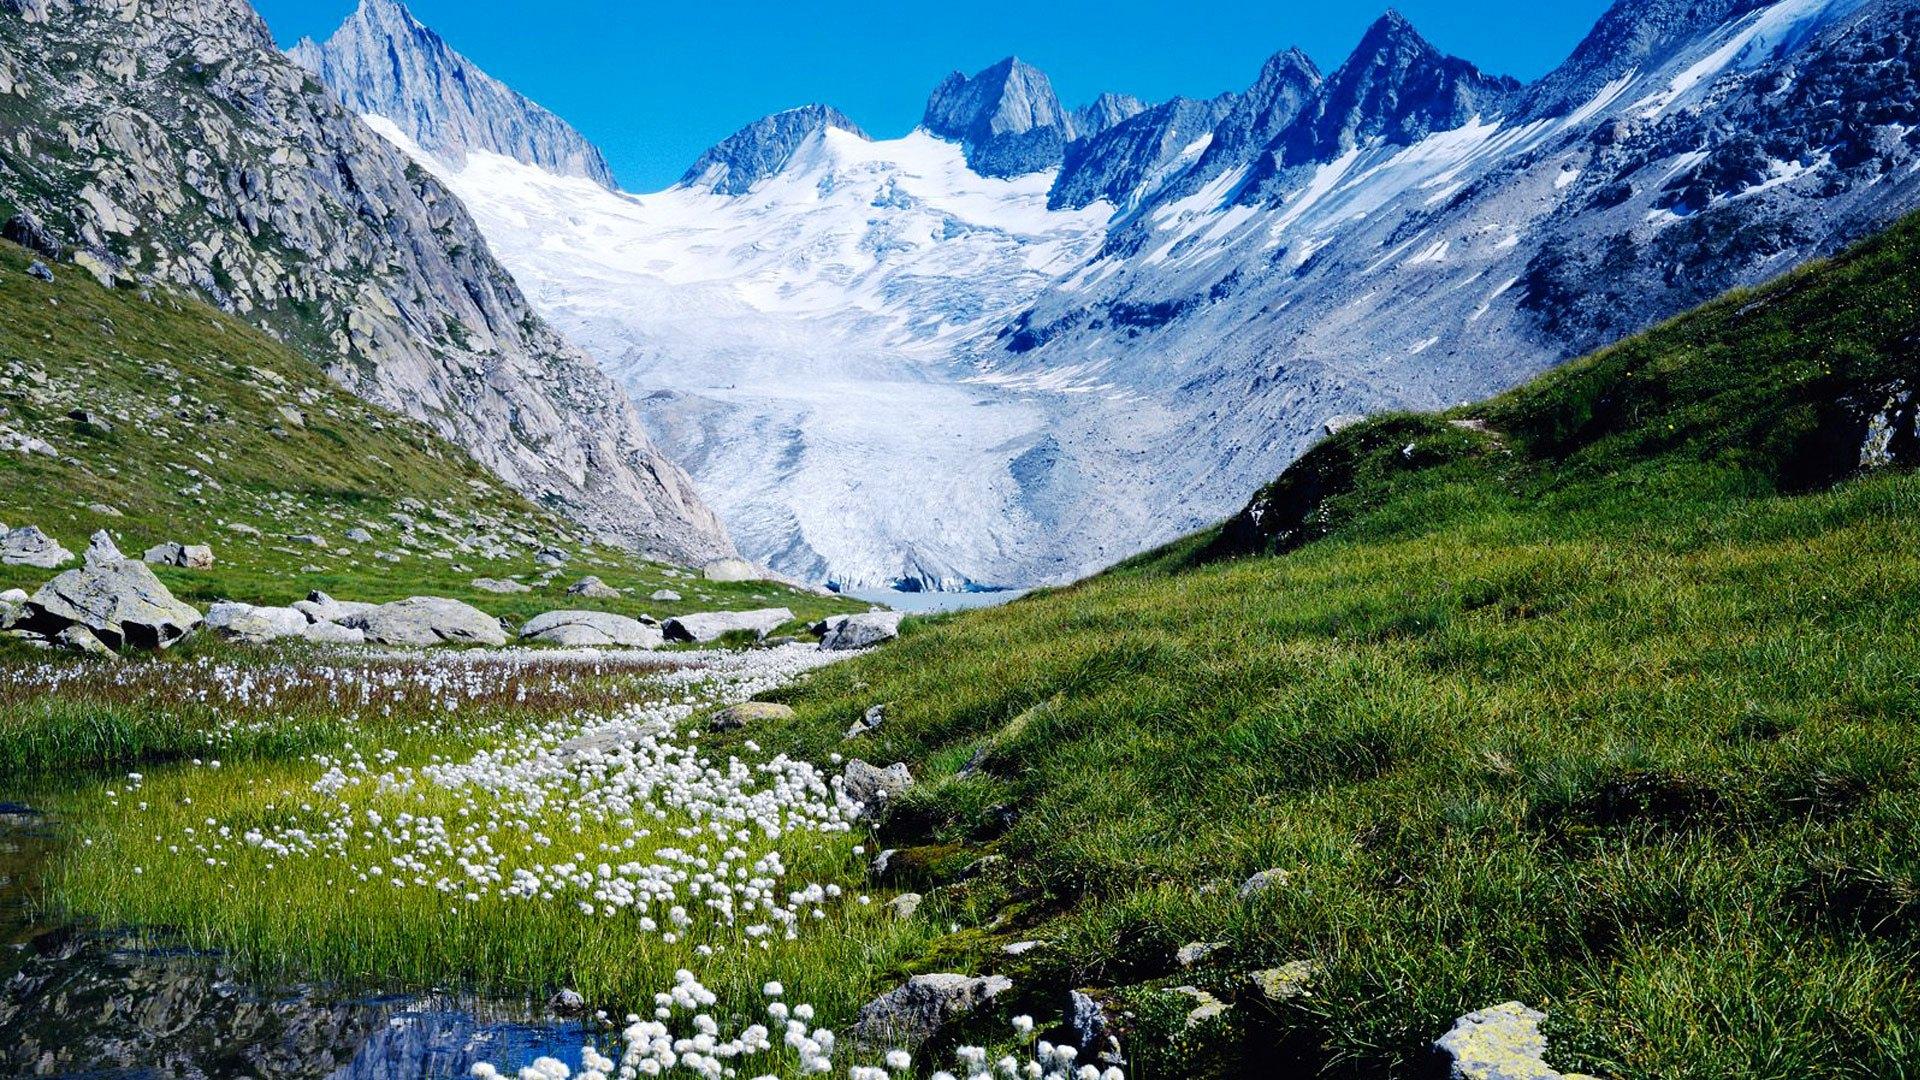 Beautiful Nature in Switzerland Wallpapers Live HD Wallpaper HQ 1920x1080